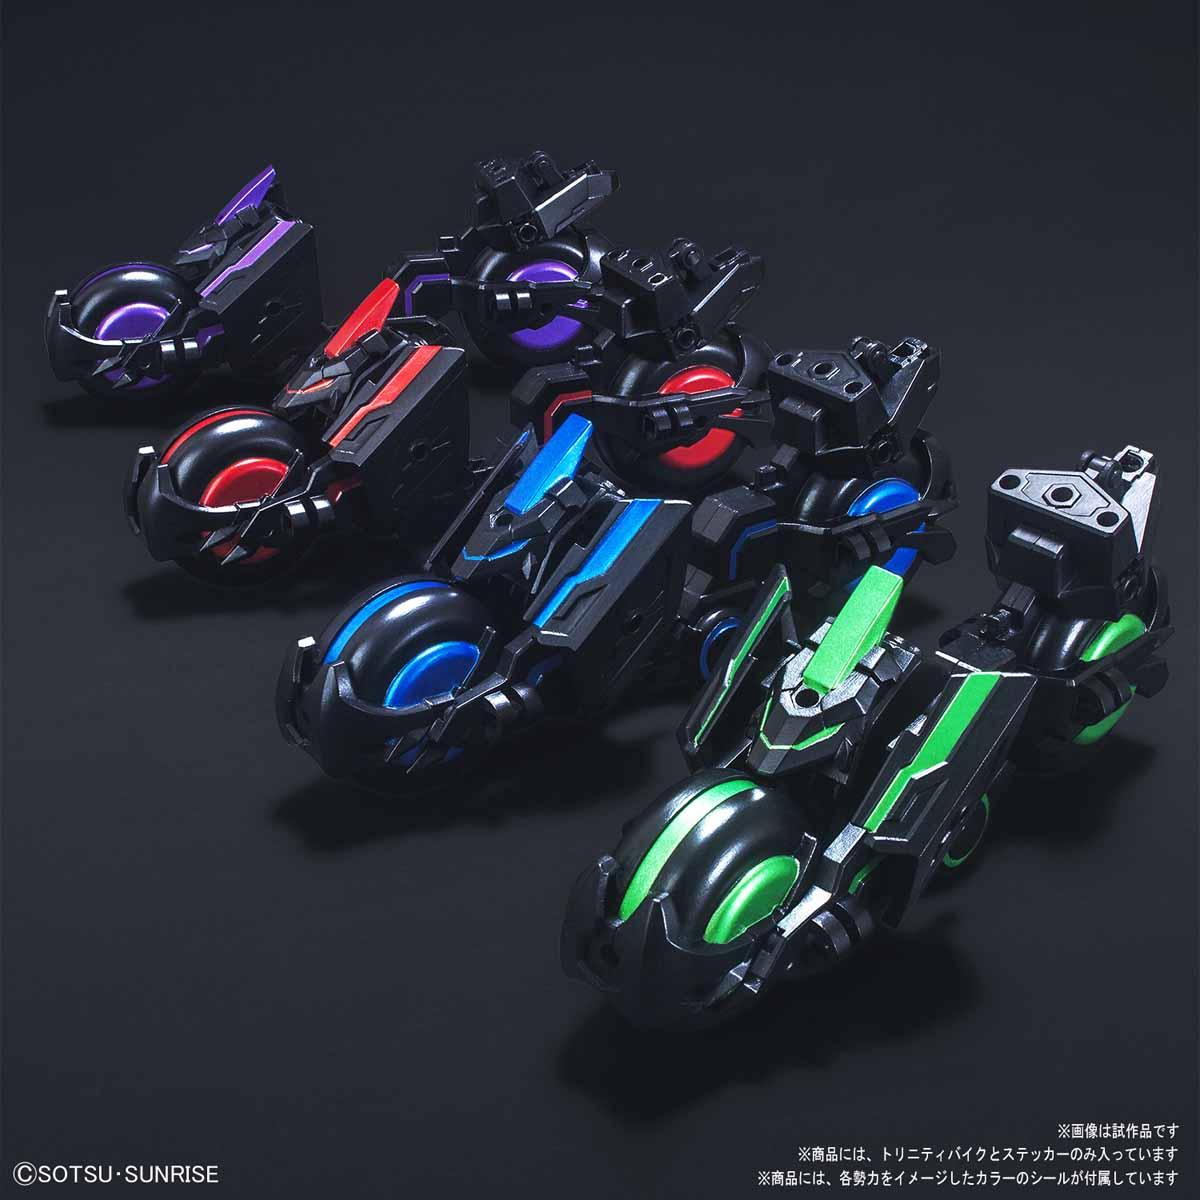 SD 三国創傑伝 トリニティバイク 商品画像